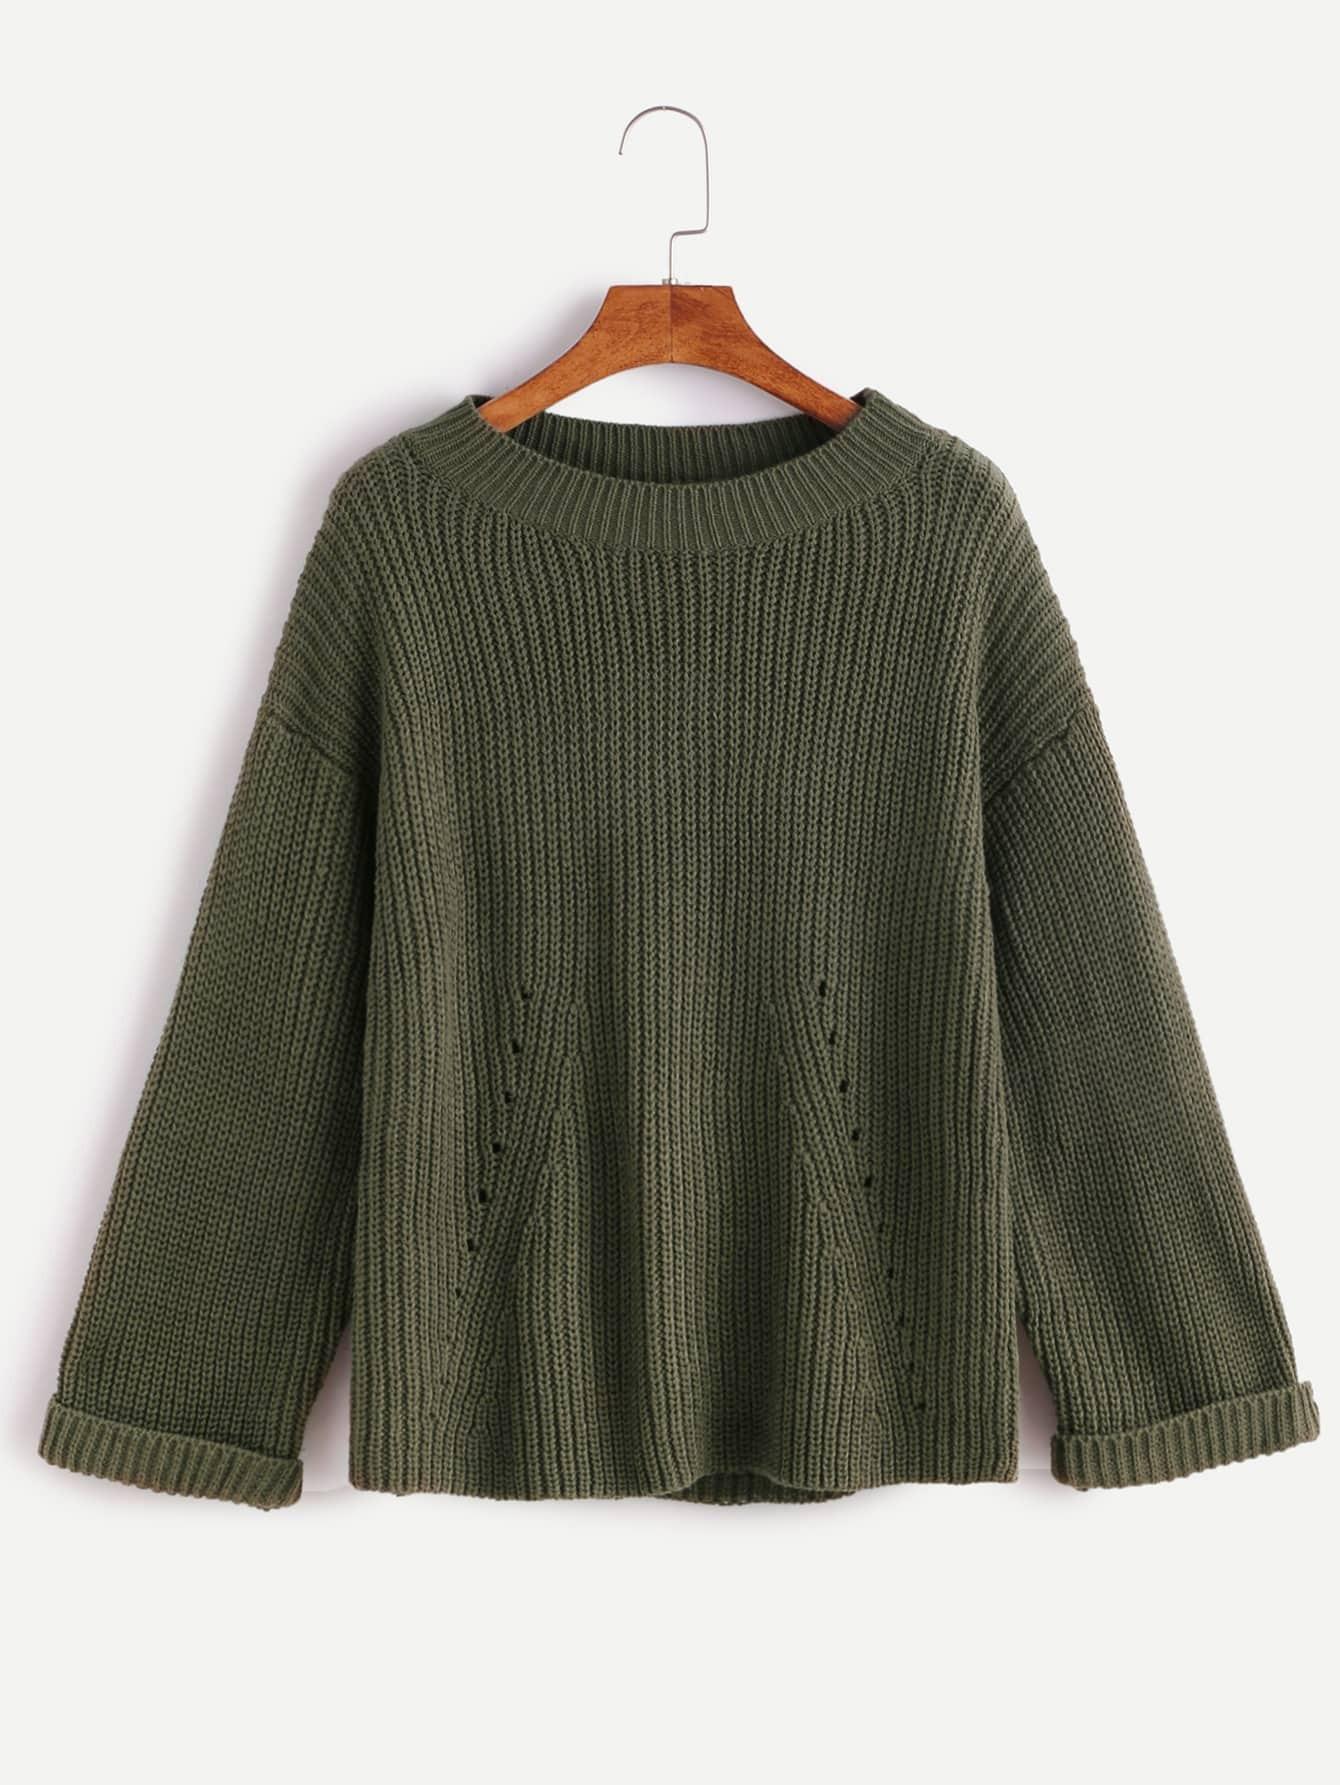 Army Green Drop Shoulder Hollow Cuffed Frayed SweaterArmy Green Drop Shoulder Hollow Cuffed Frayed Sweater<br><br>color: Green<br>size: one-size